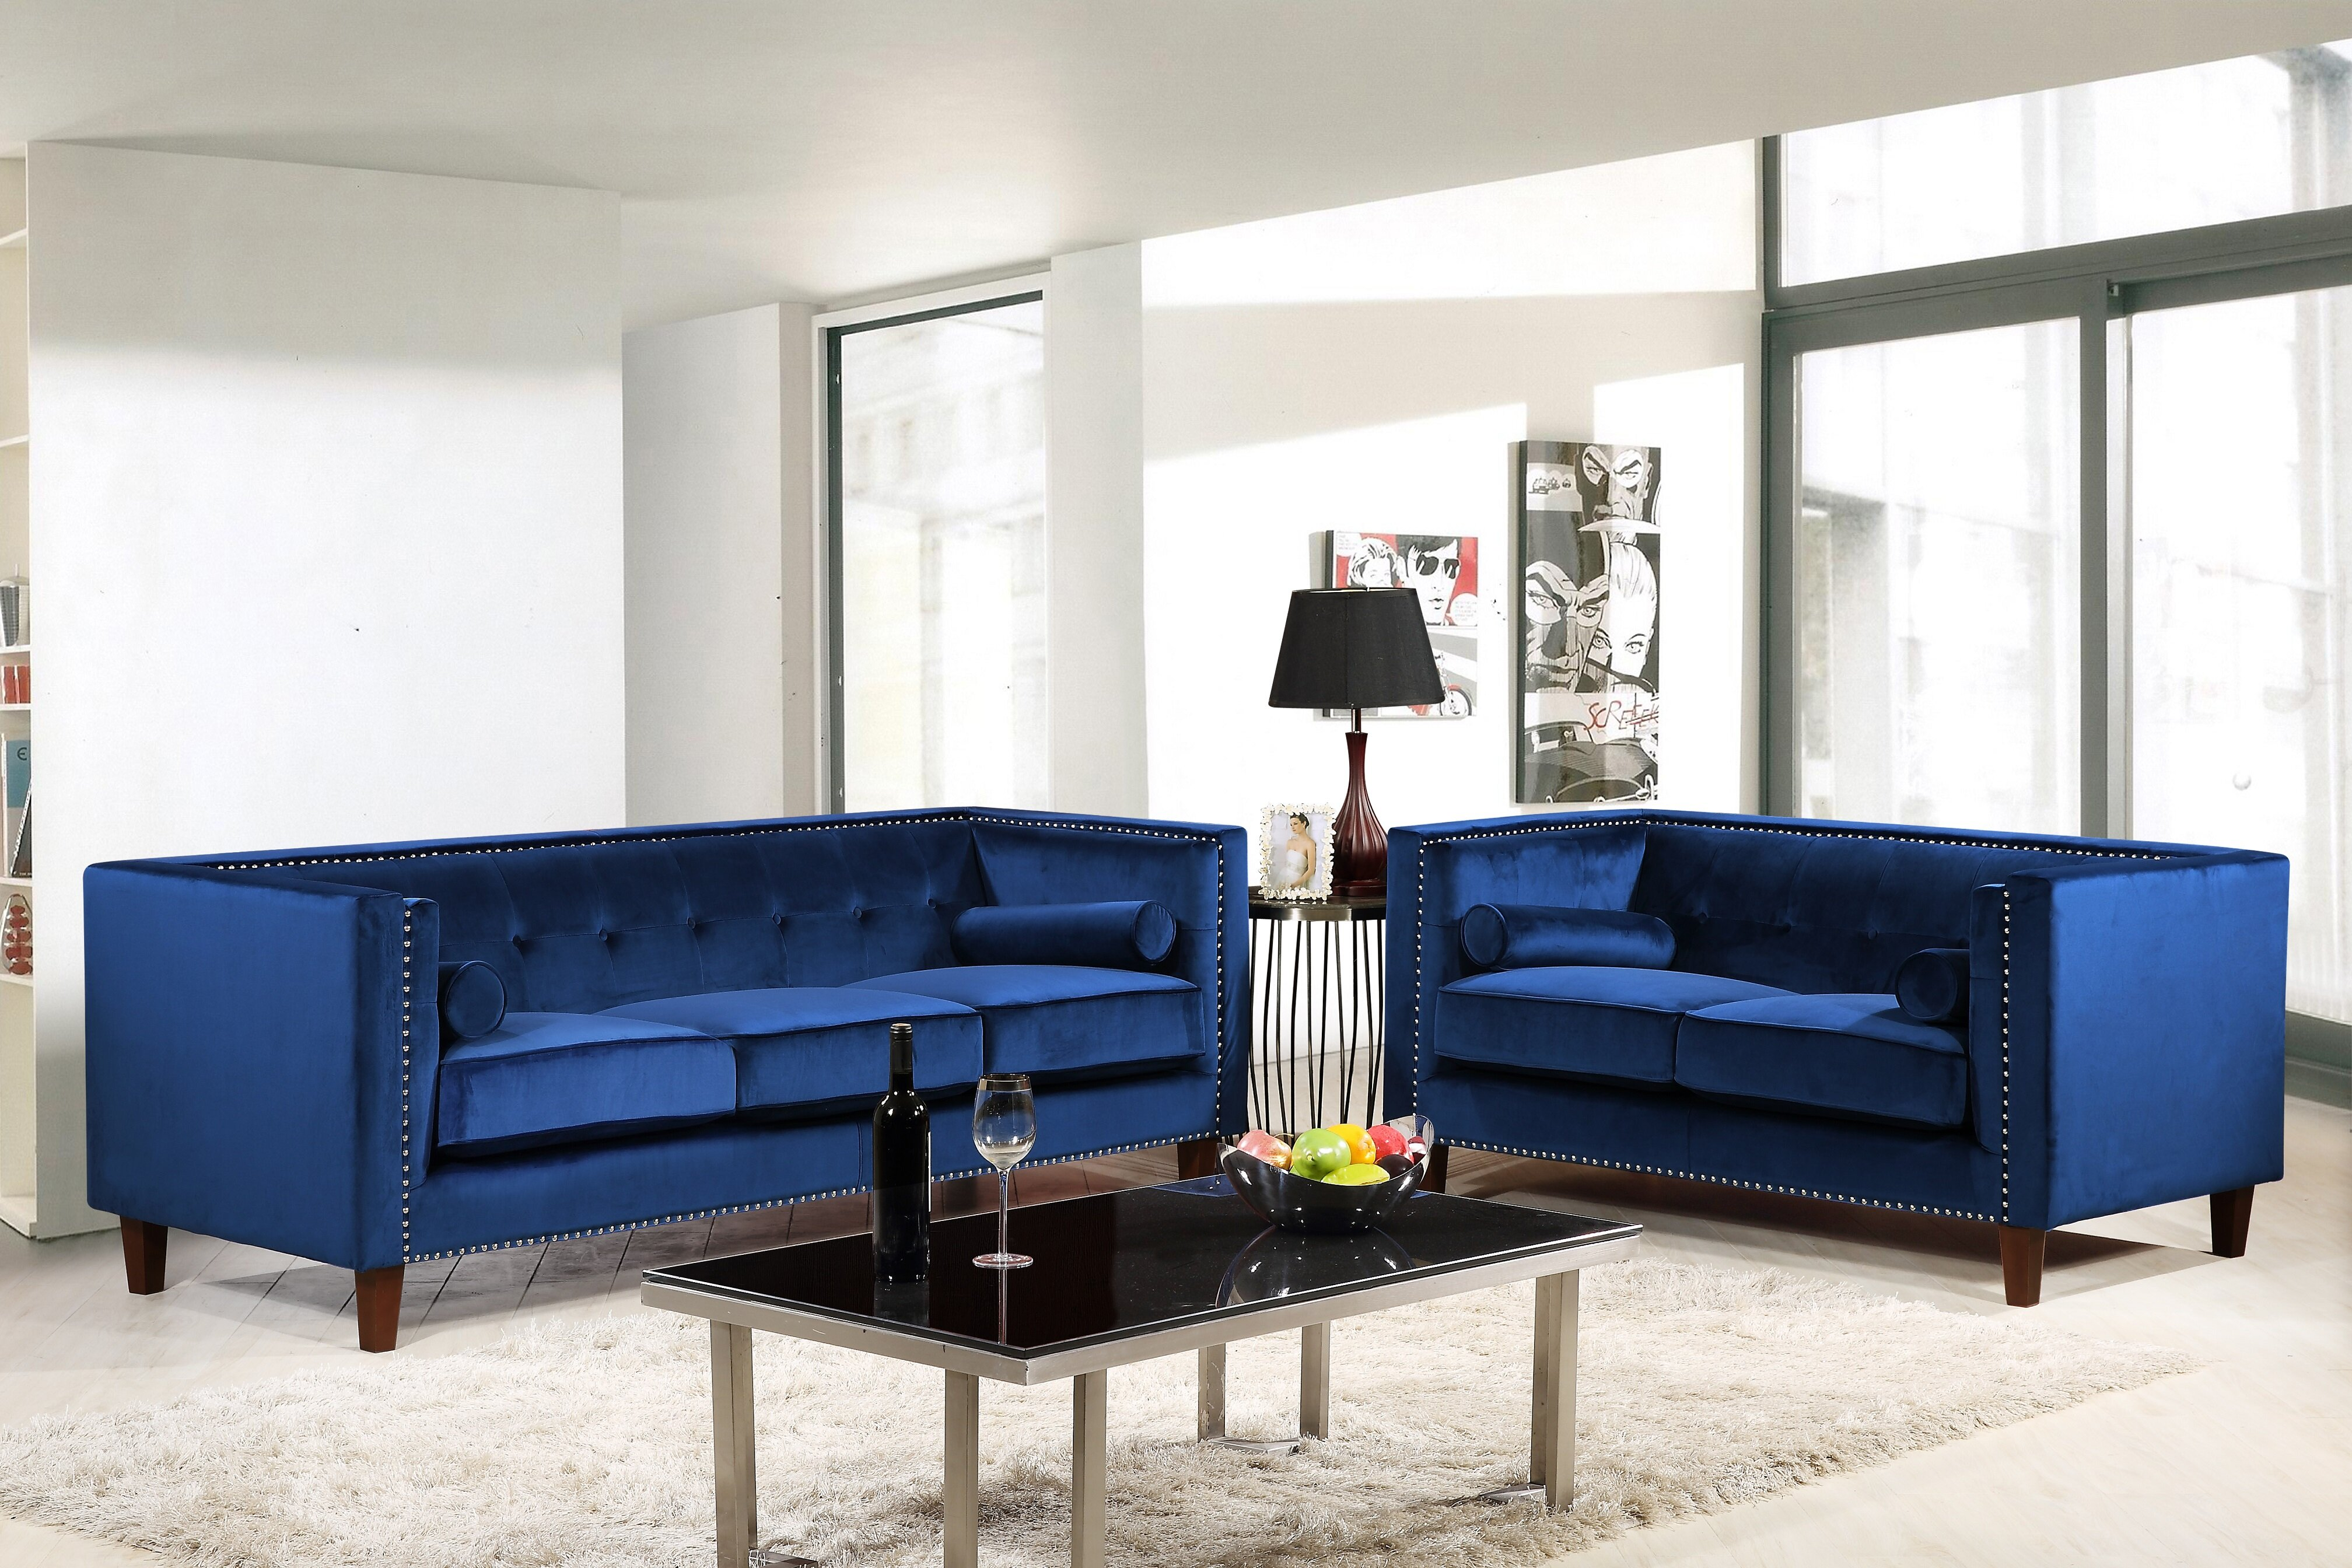 Everly quinn kittleson classic nailhead chesterfield 2 piece living room set wayfair